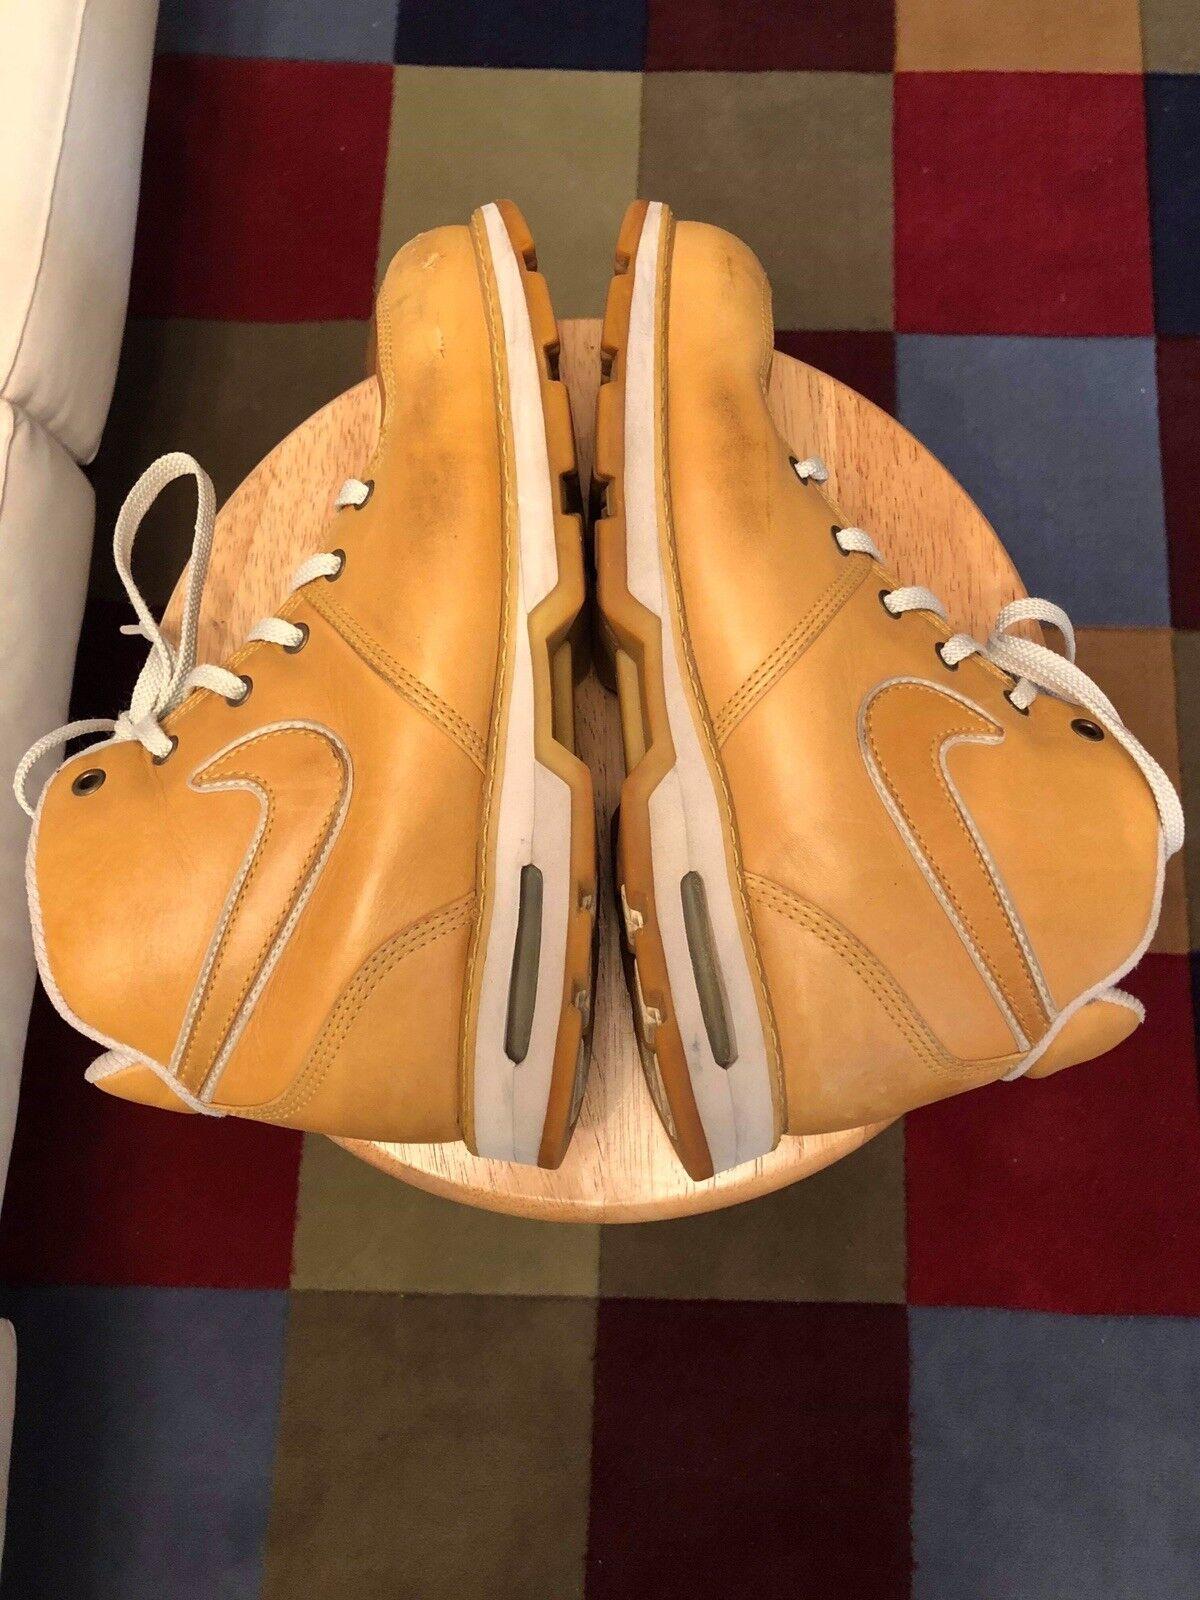 Nike 040709 Footbed Hi Top Tan Uomini Us10 Modellato Footbed 040709 Anfibi Le   Di Camoscio a3150b